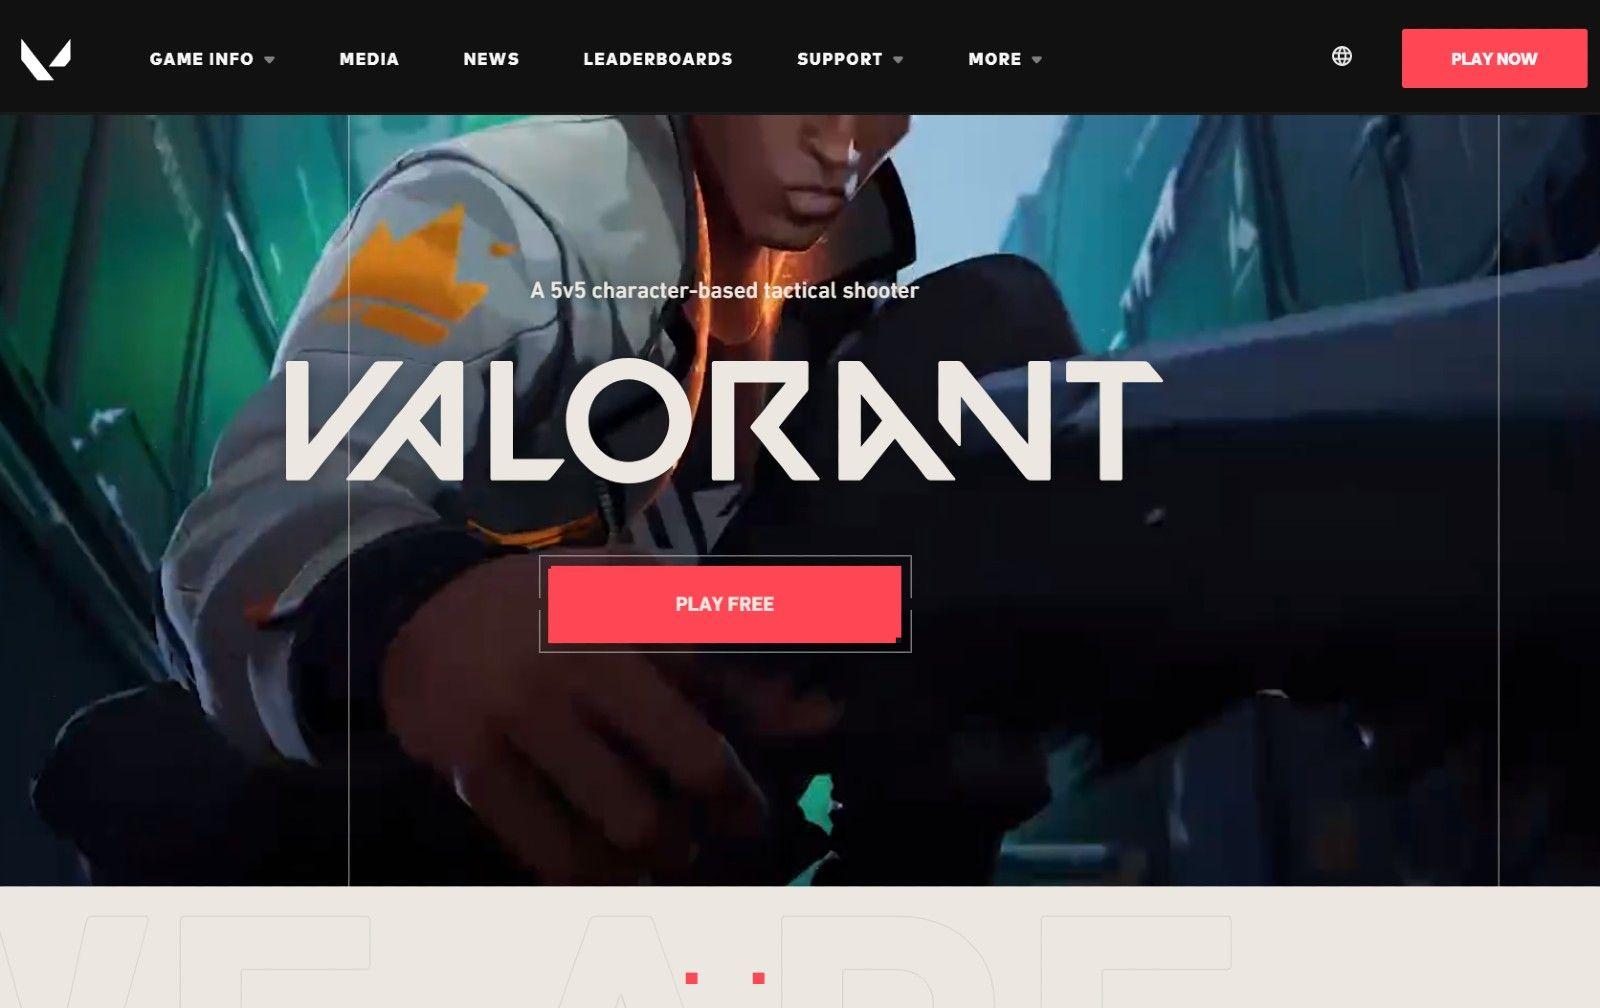 Valorant download